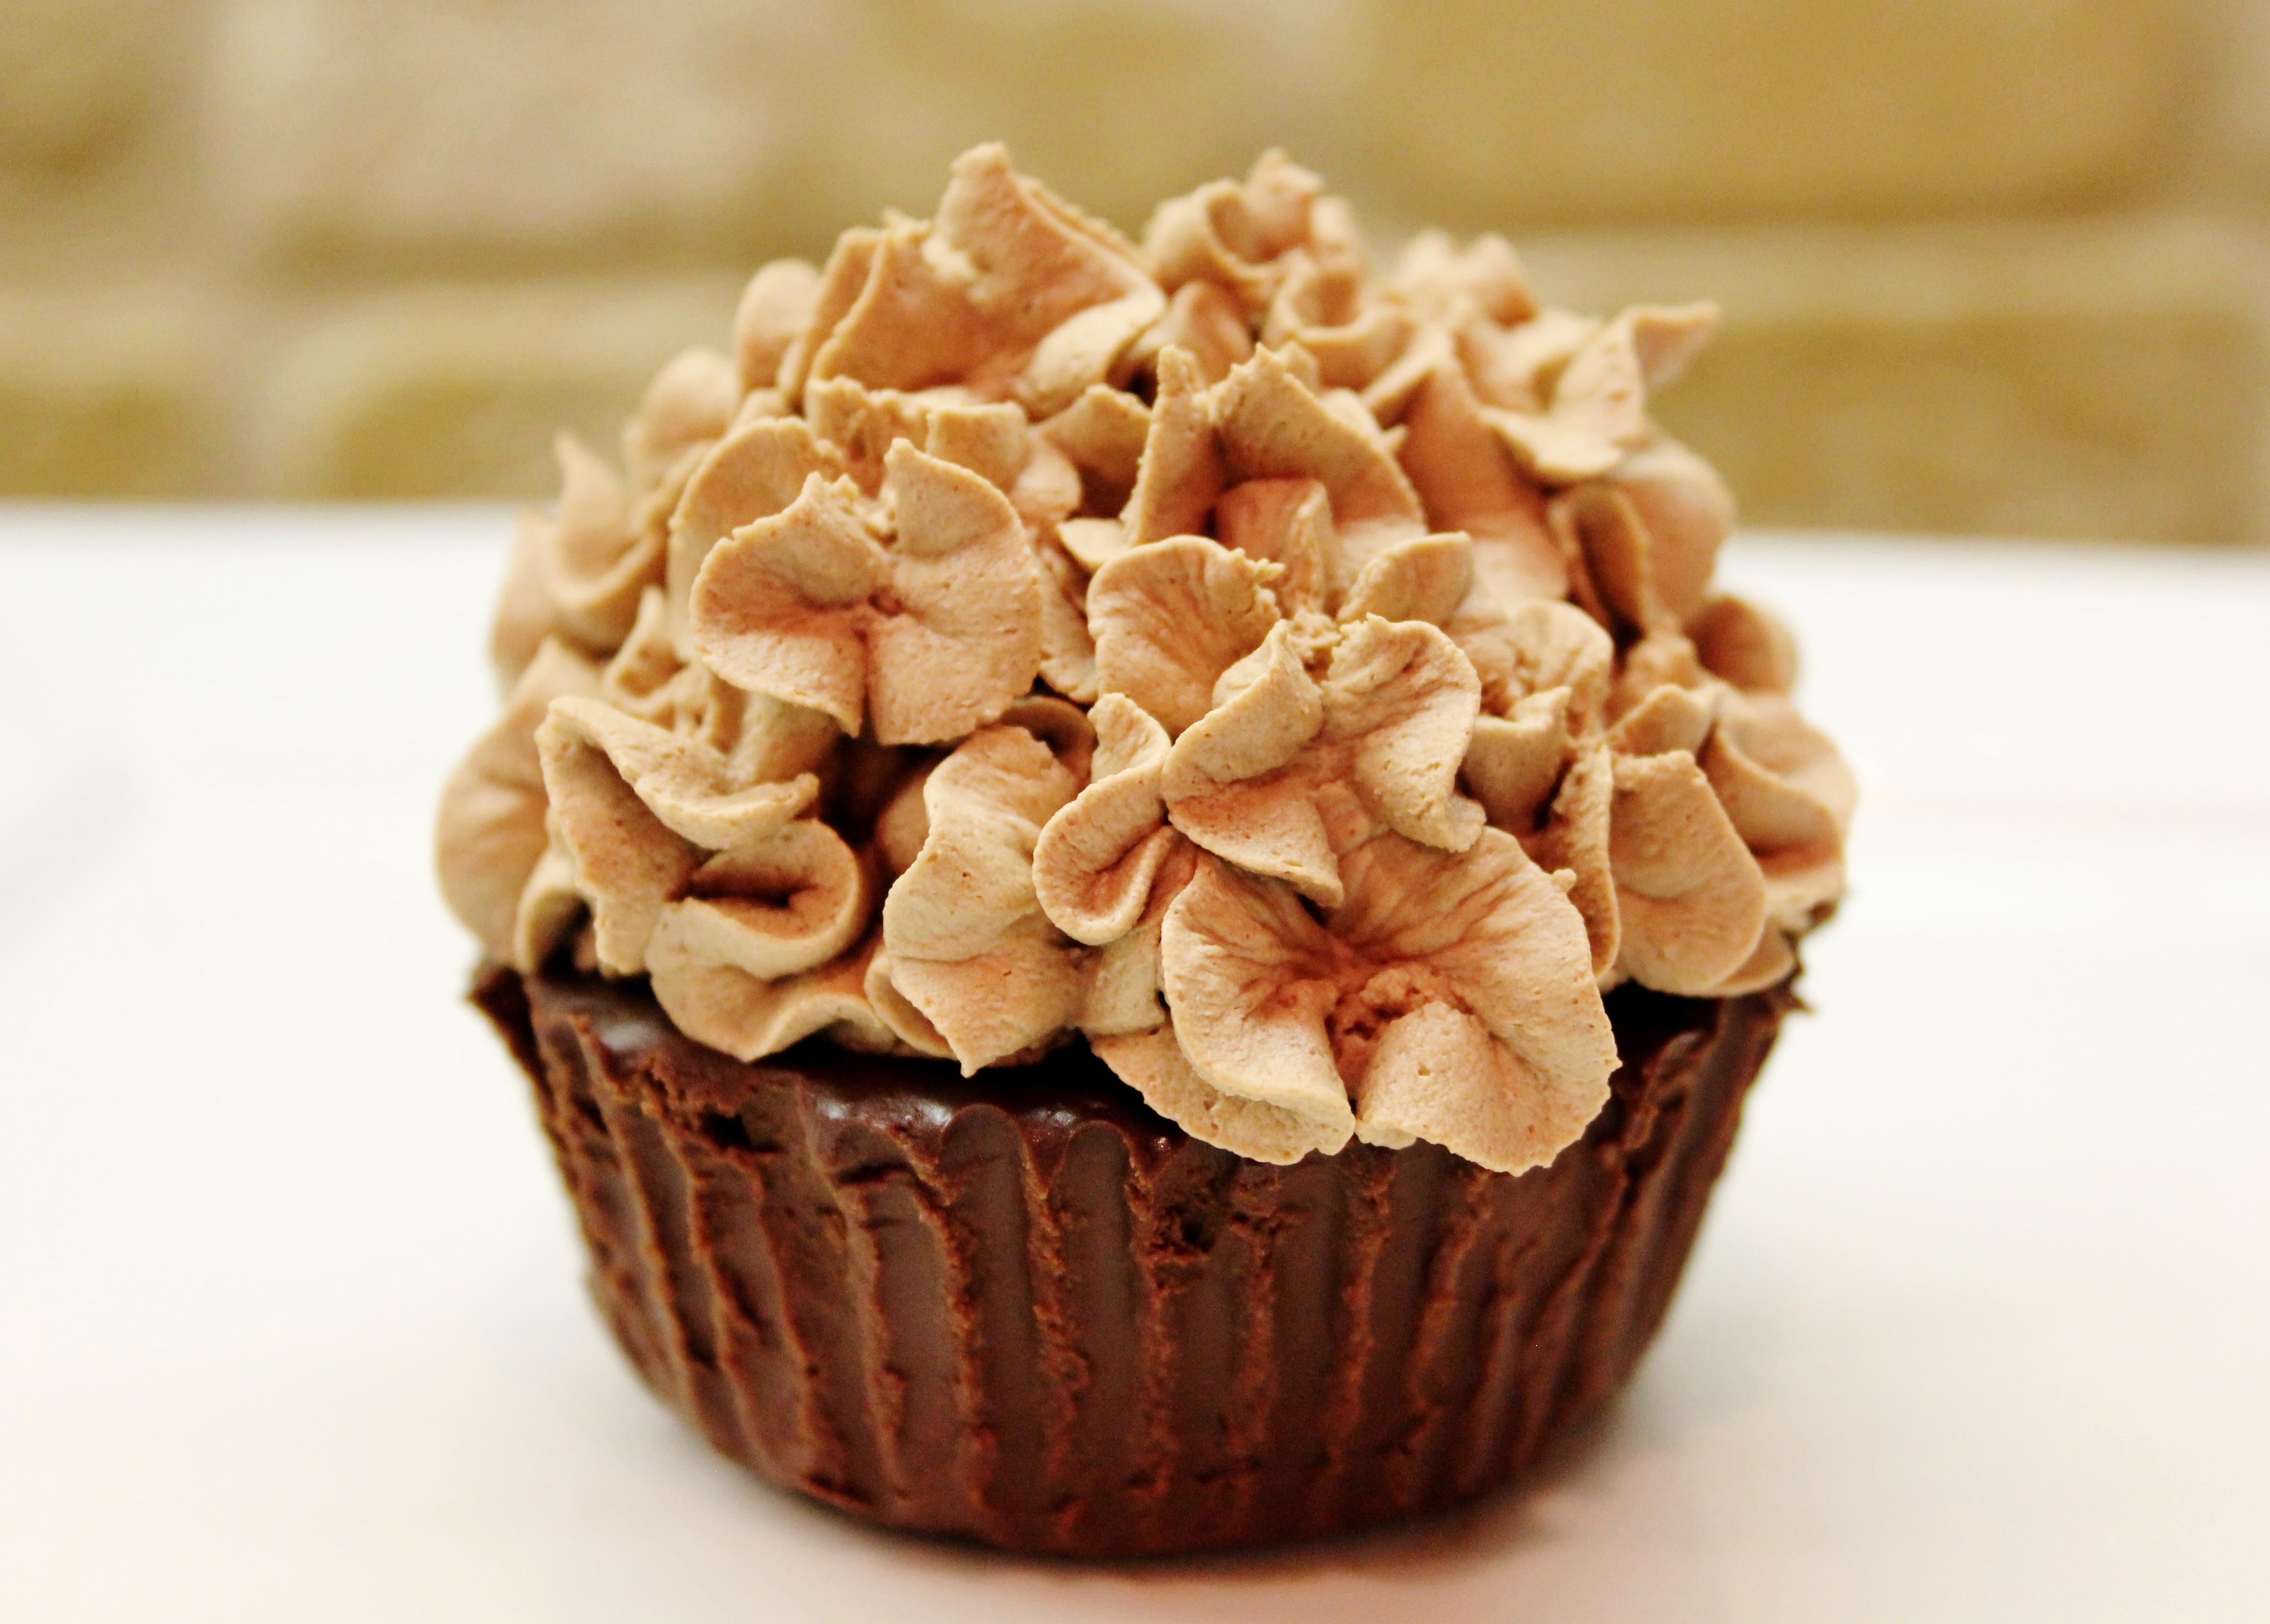 Flourless Double Chocolate Cupcakes (gluten/grain/nut/egg free)